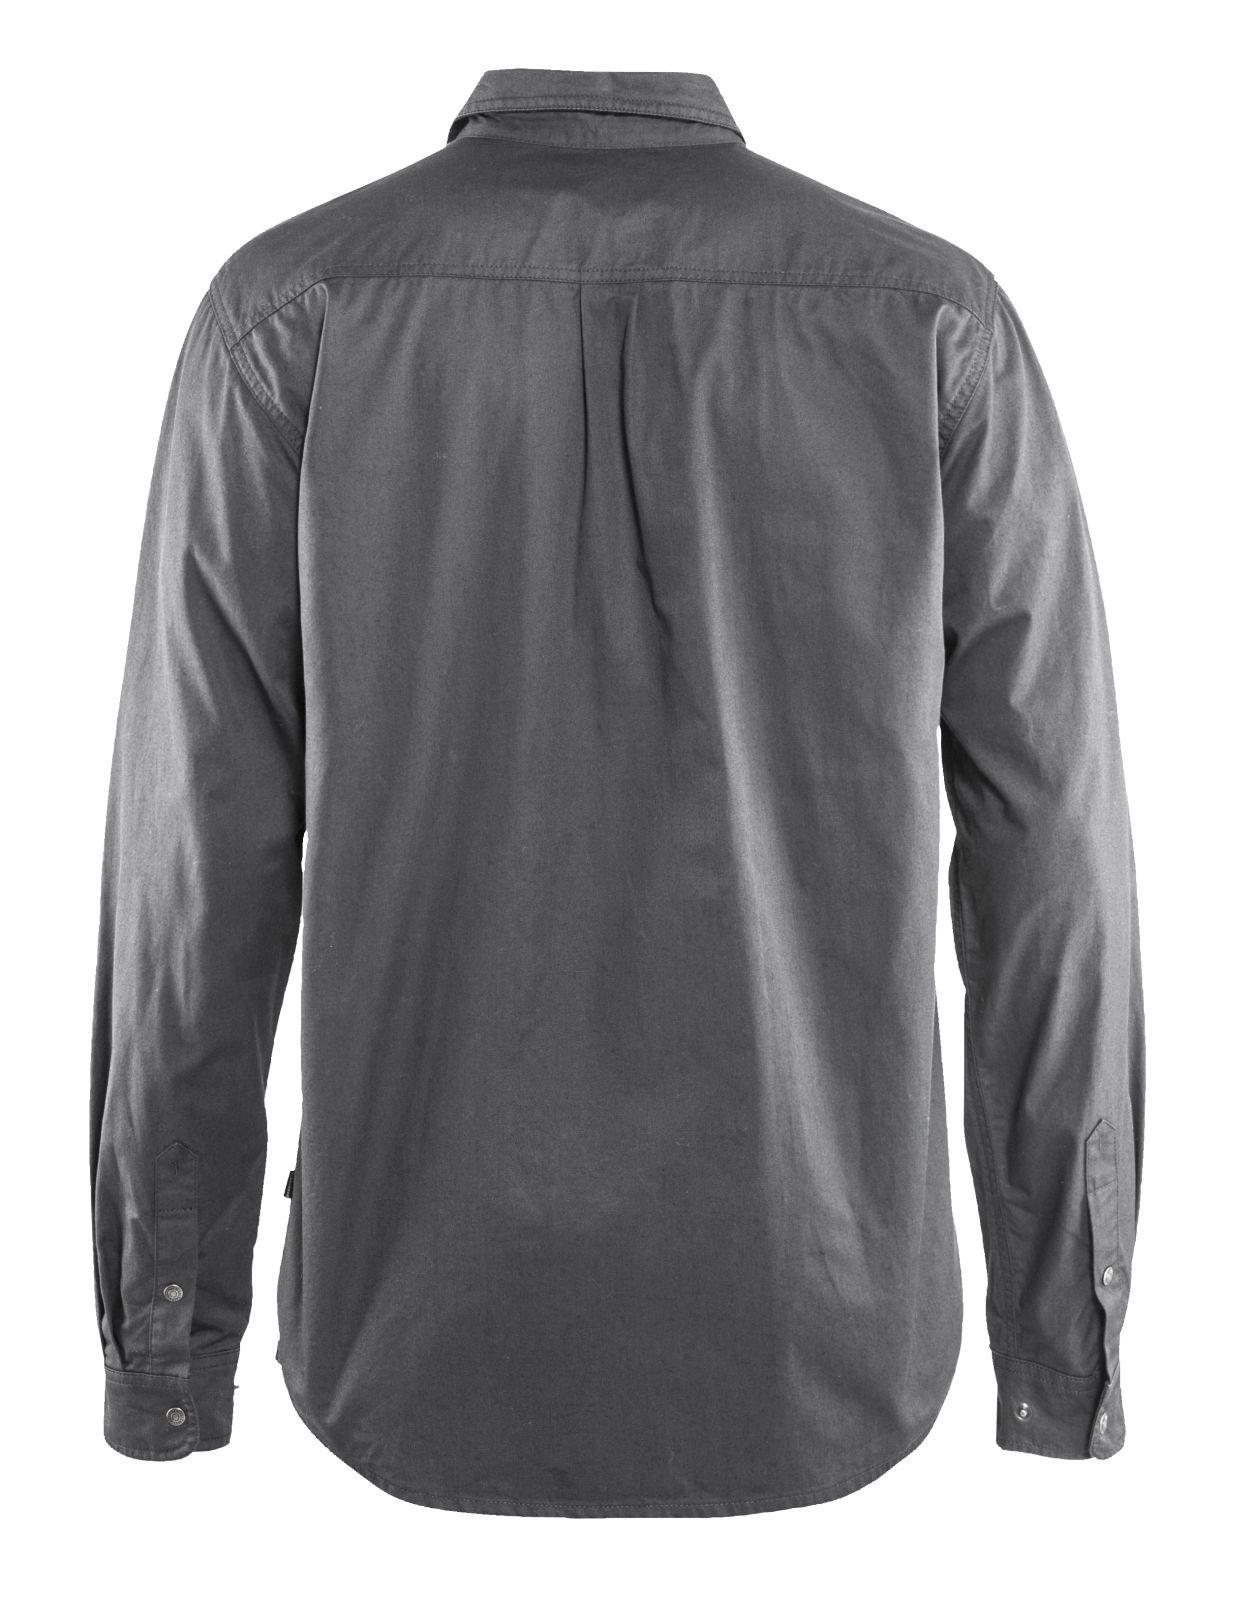 Blaklader Shirts 32971135 grijs(9400)